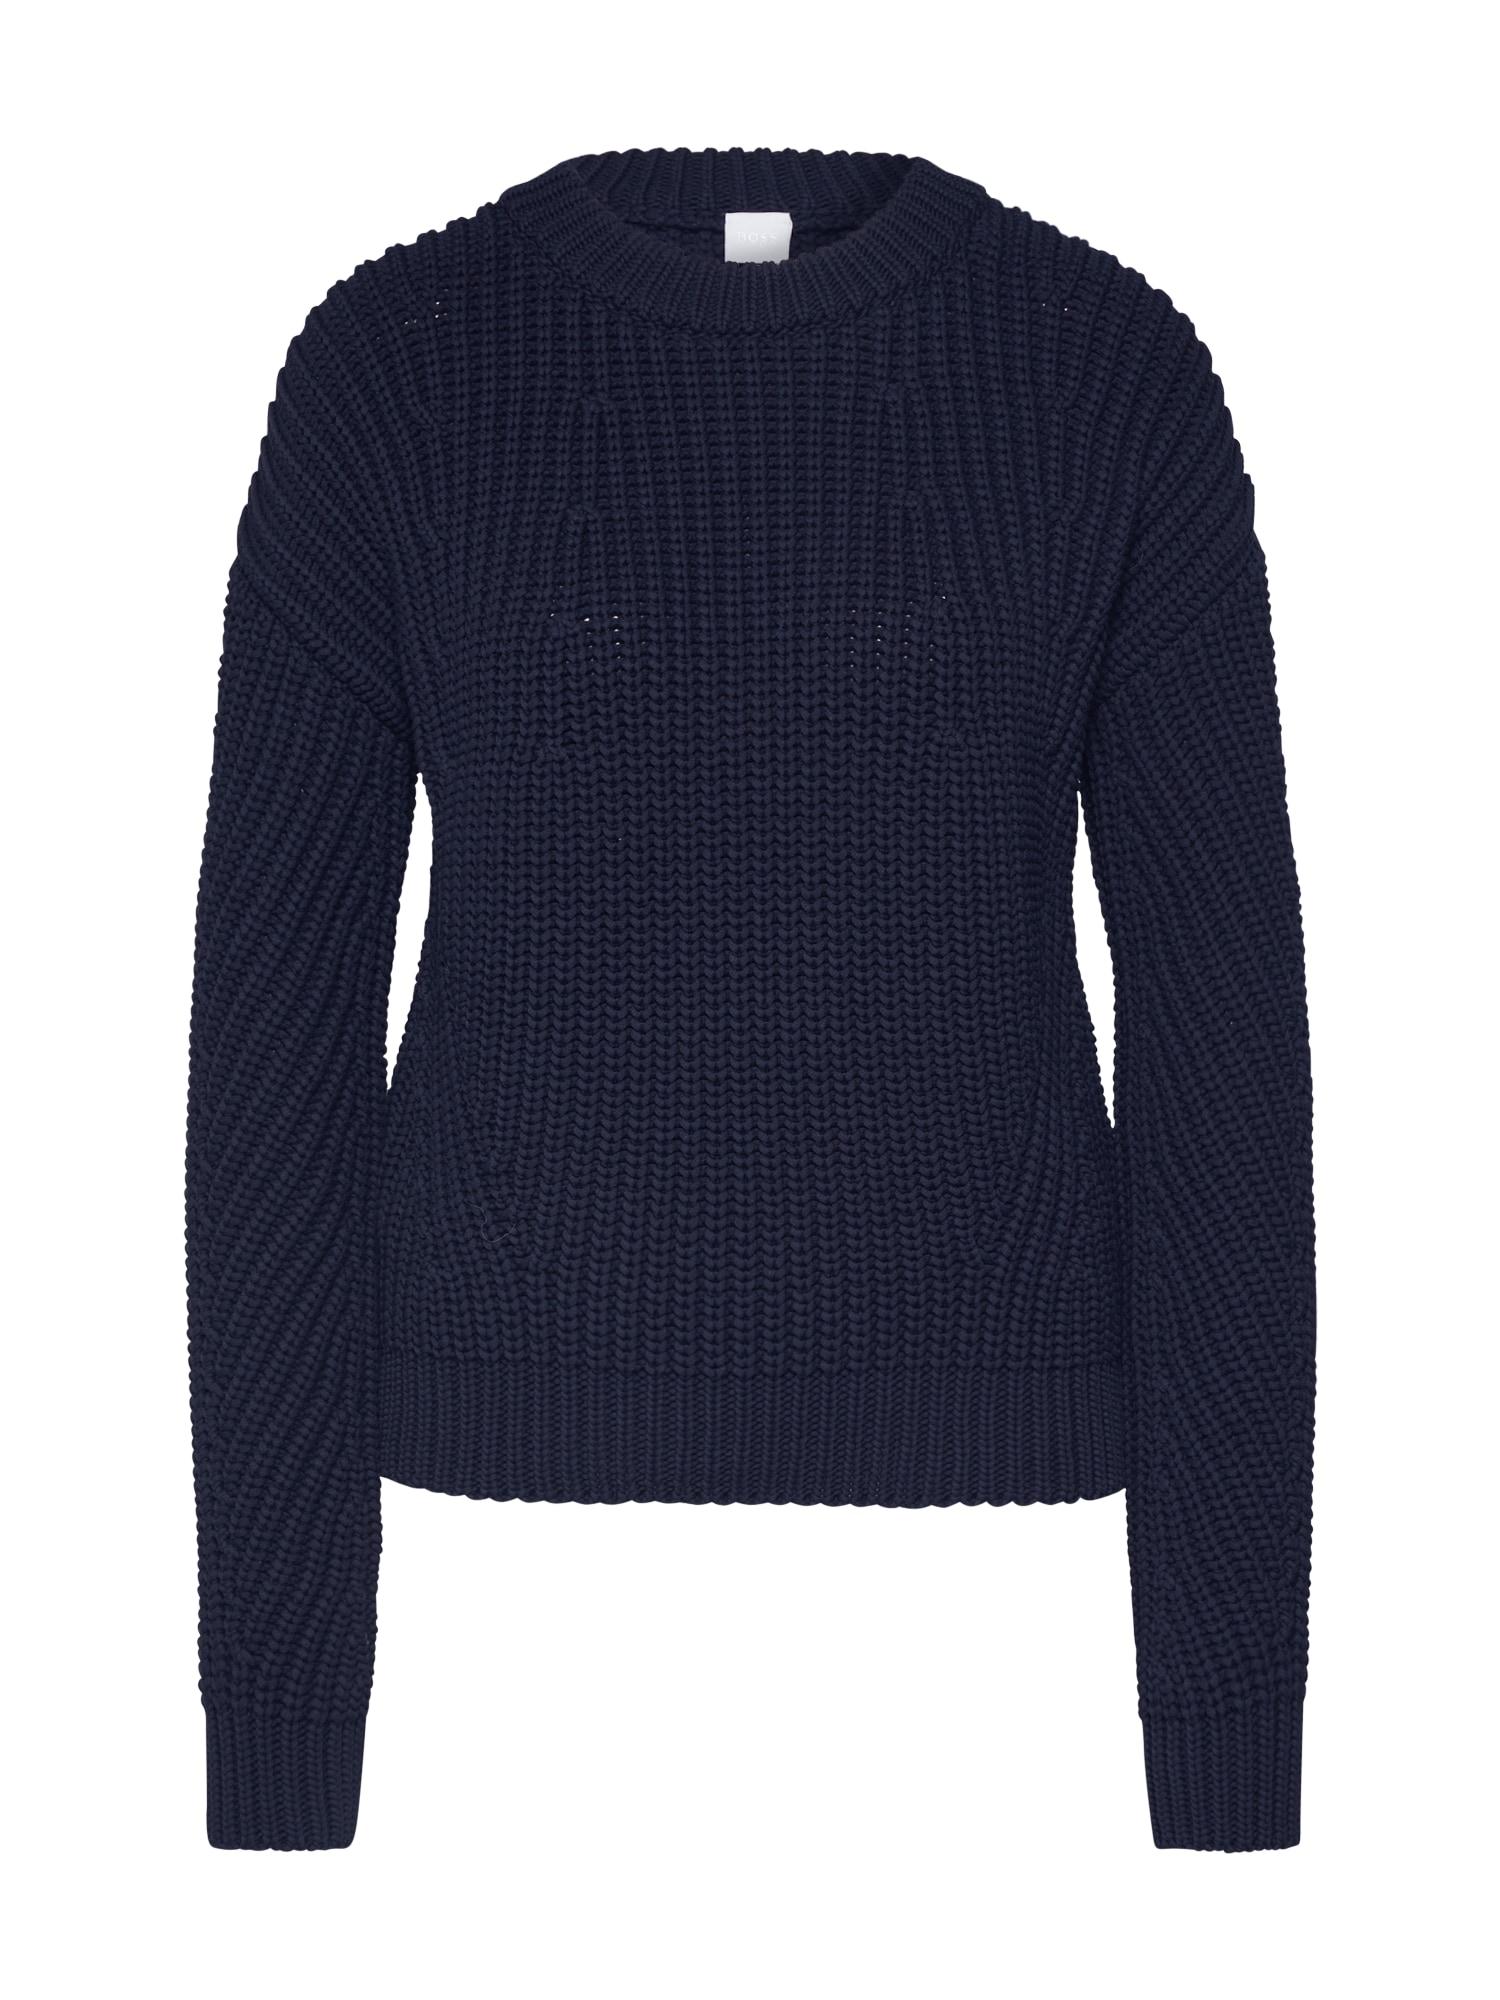 BOSS Megztinis 'Waynetta' mėlyna